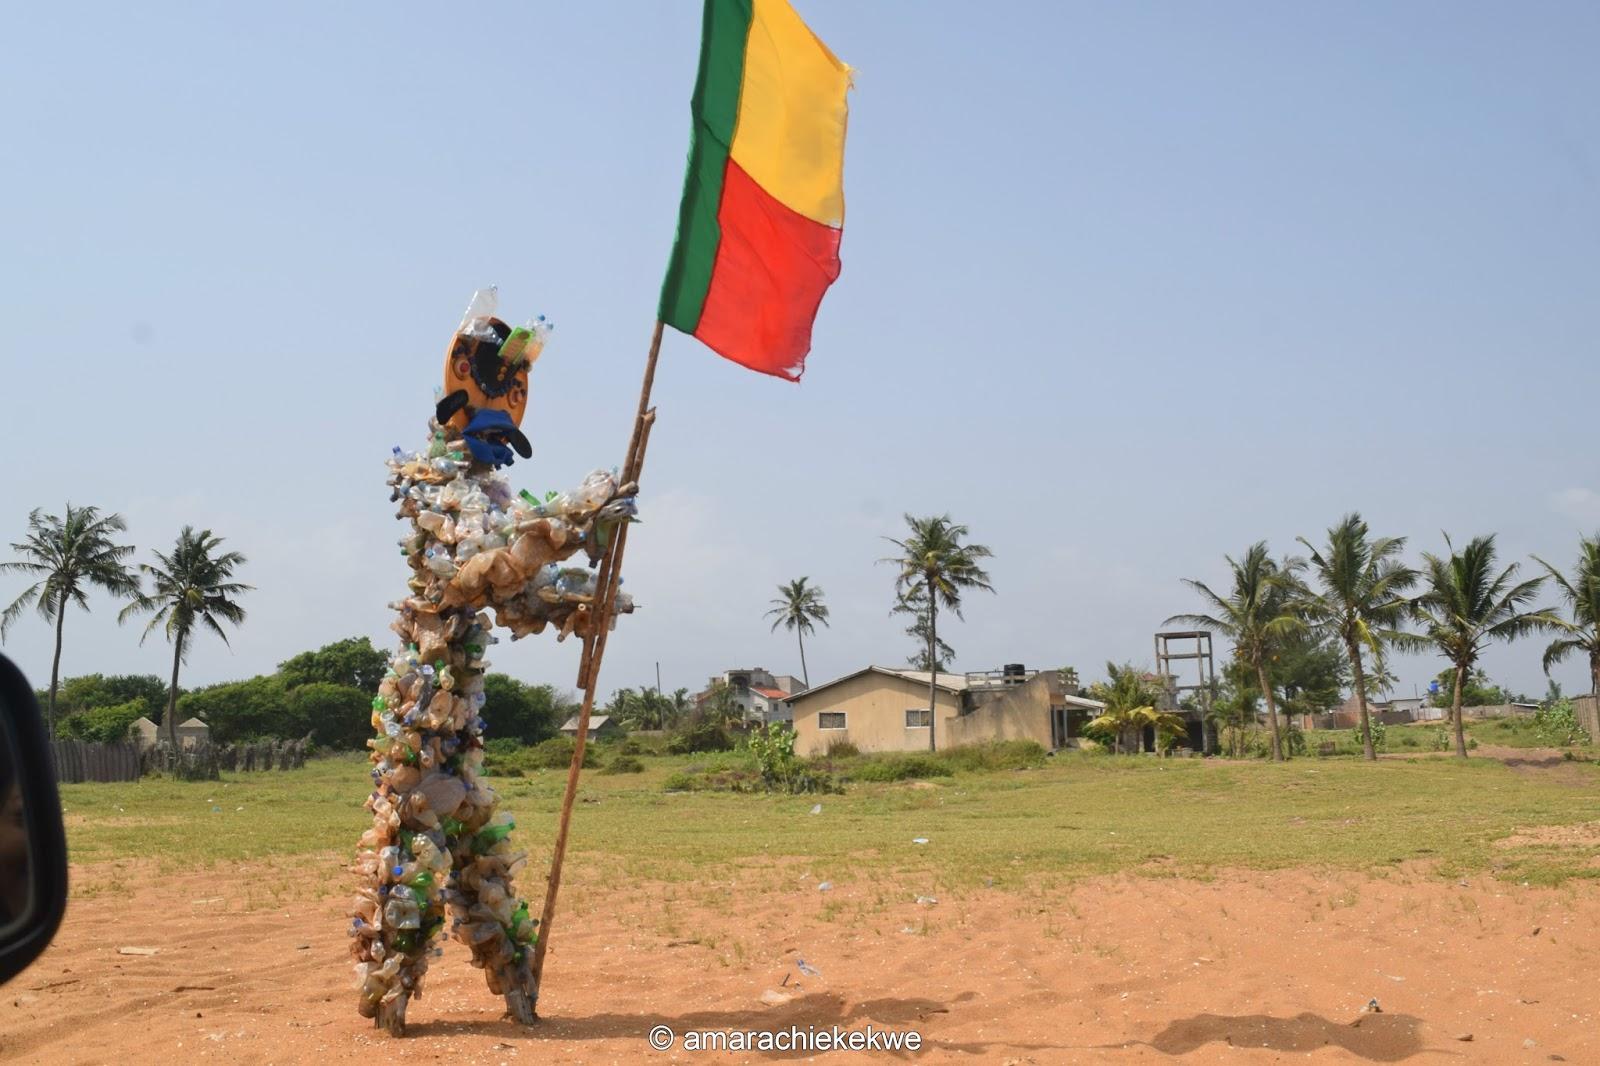 Travel on a budget to Benin Republic